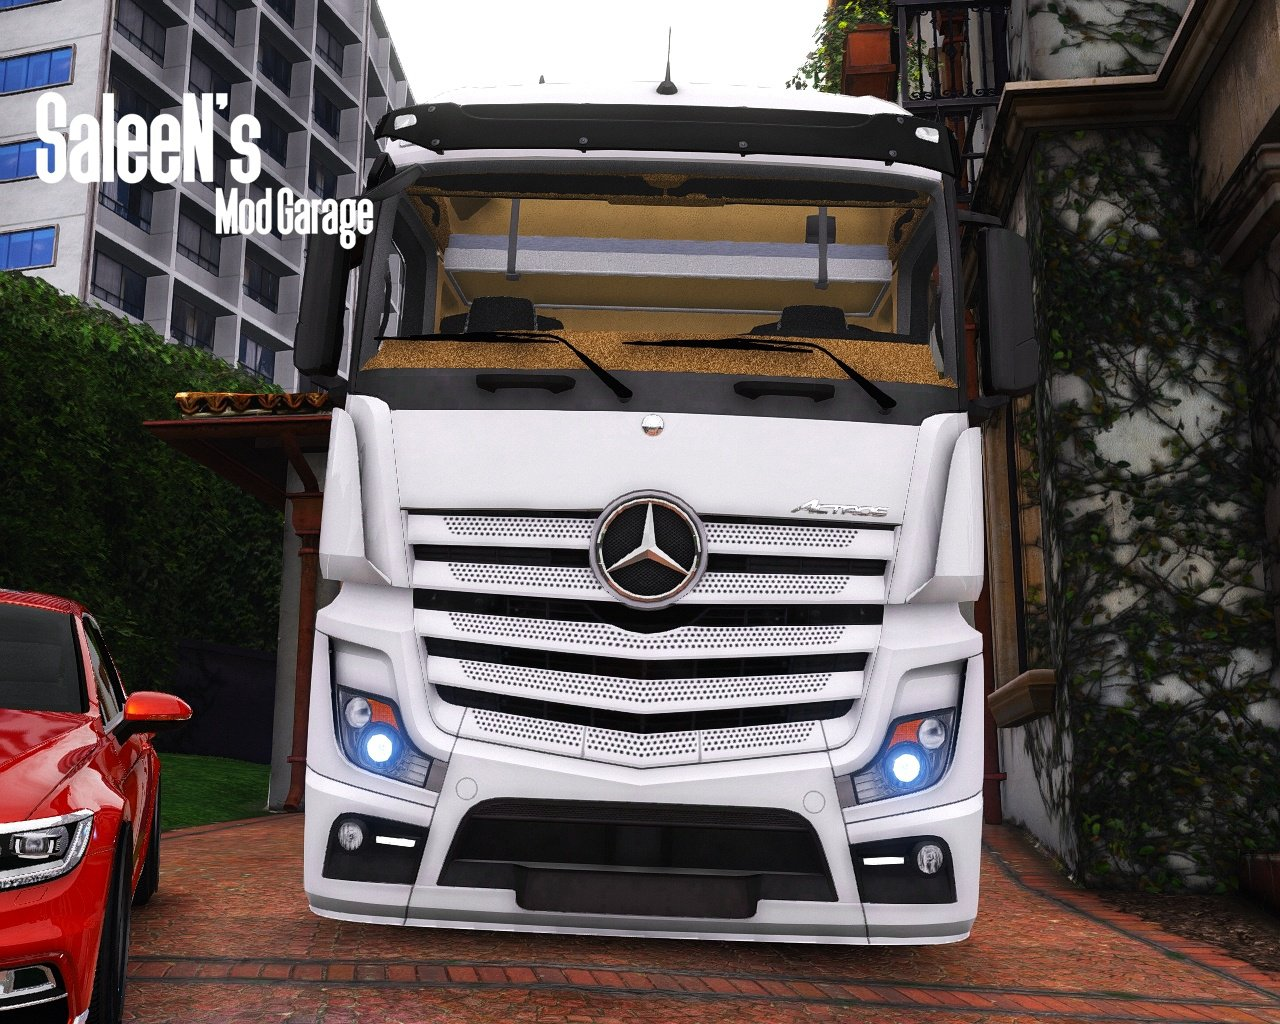 mercedes benz actros mp4 4x2 vehicules pour gta v sur gta modding. Black Bedroom Furniture Sets. Home Design Ideas